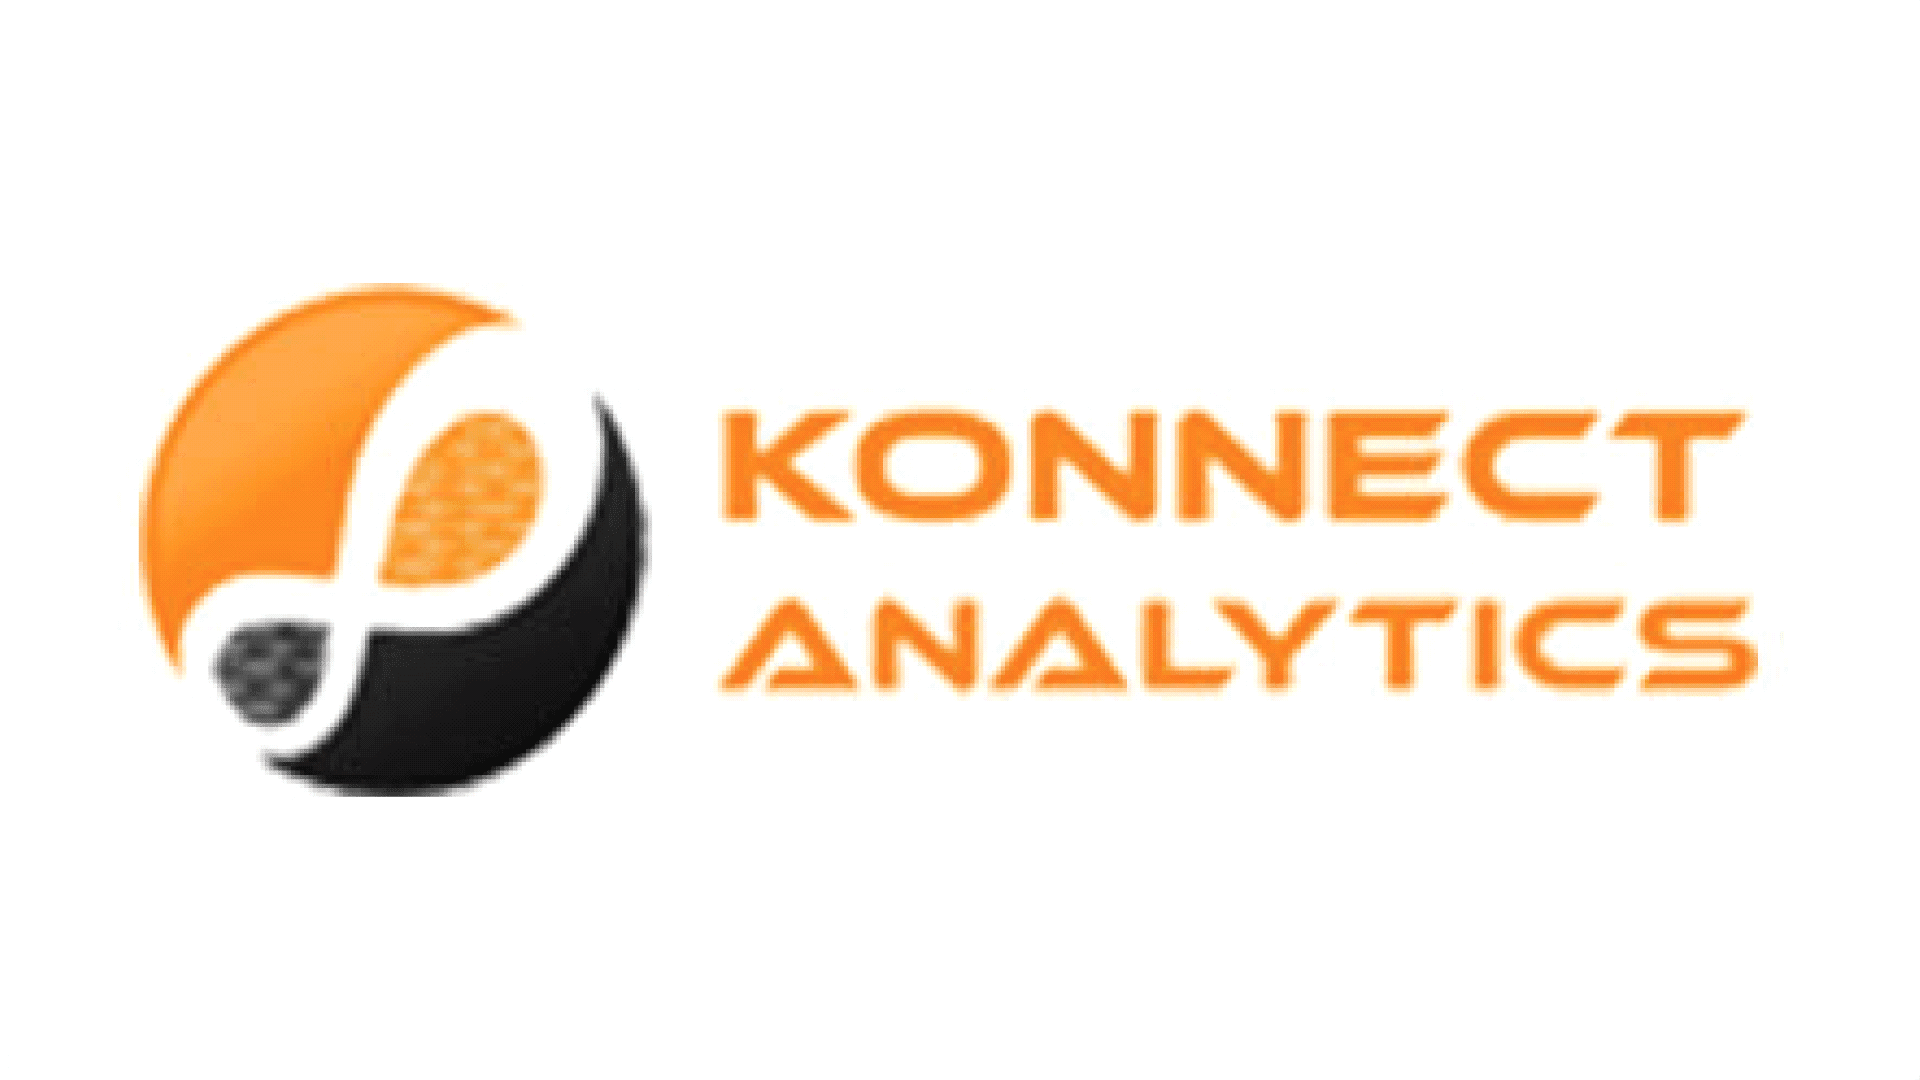 Konnect analytics